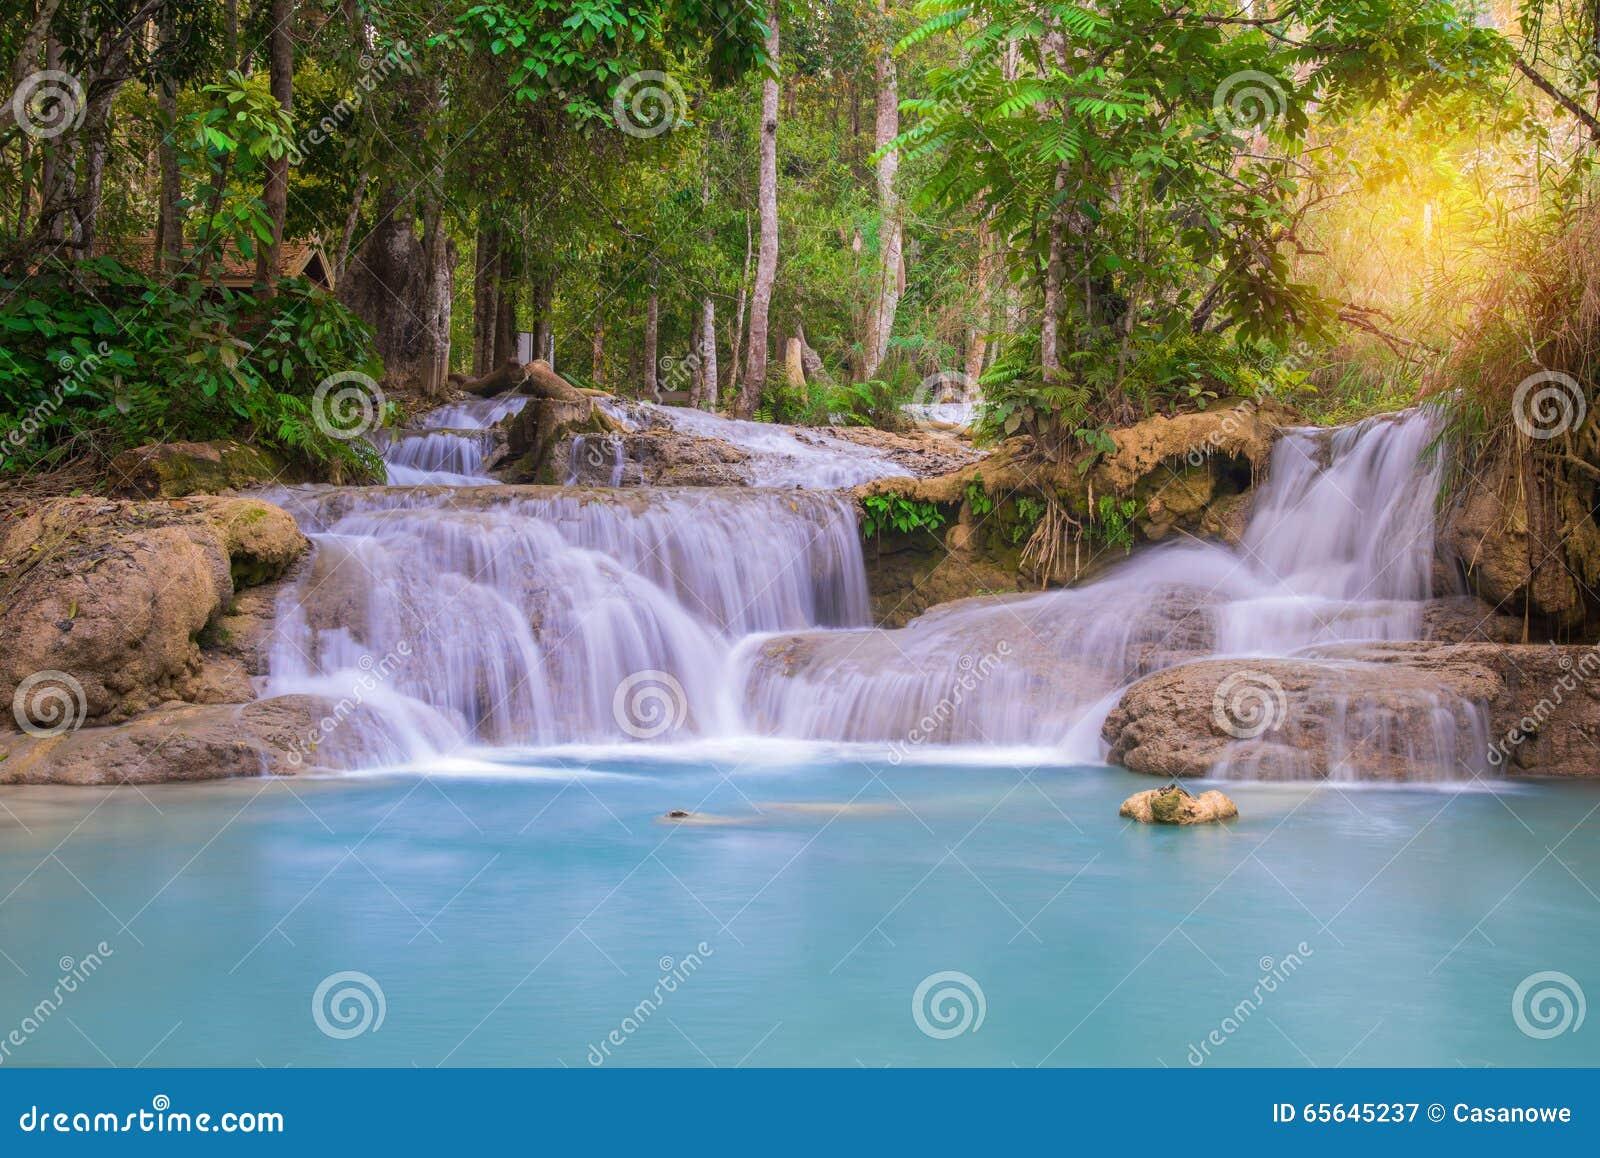 Cascade dans la forêt tropicale, Tat Kuang Si Waterfalls au praba de Luang